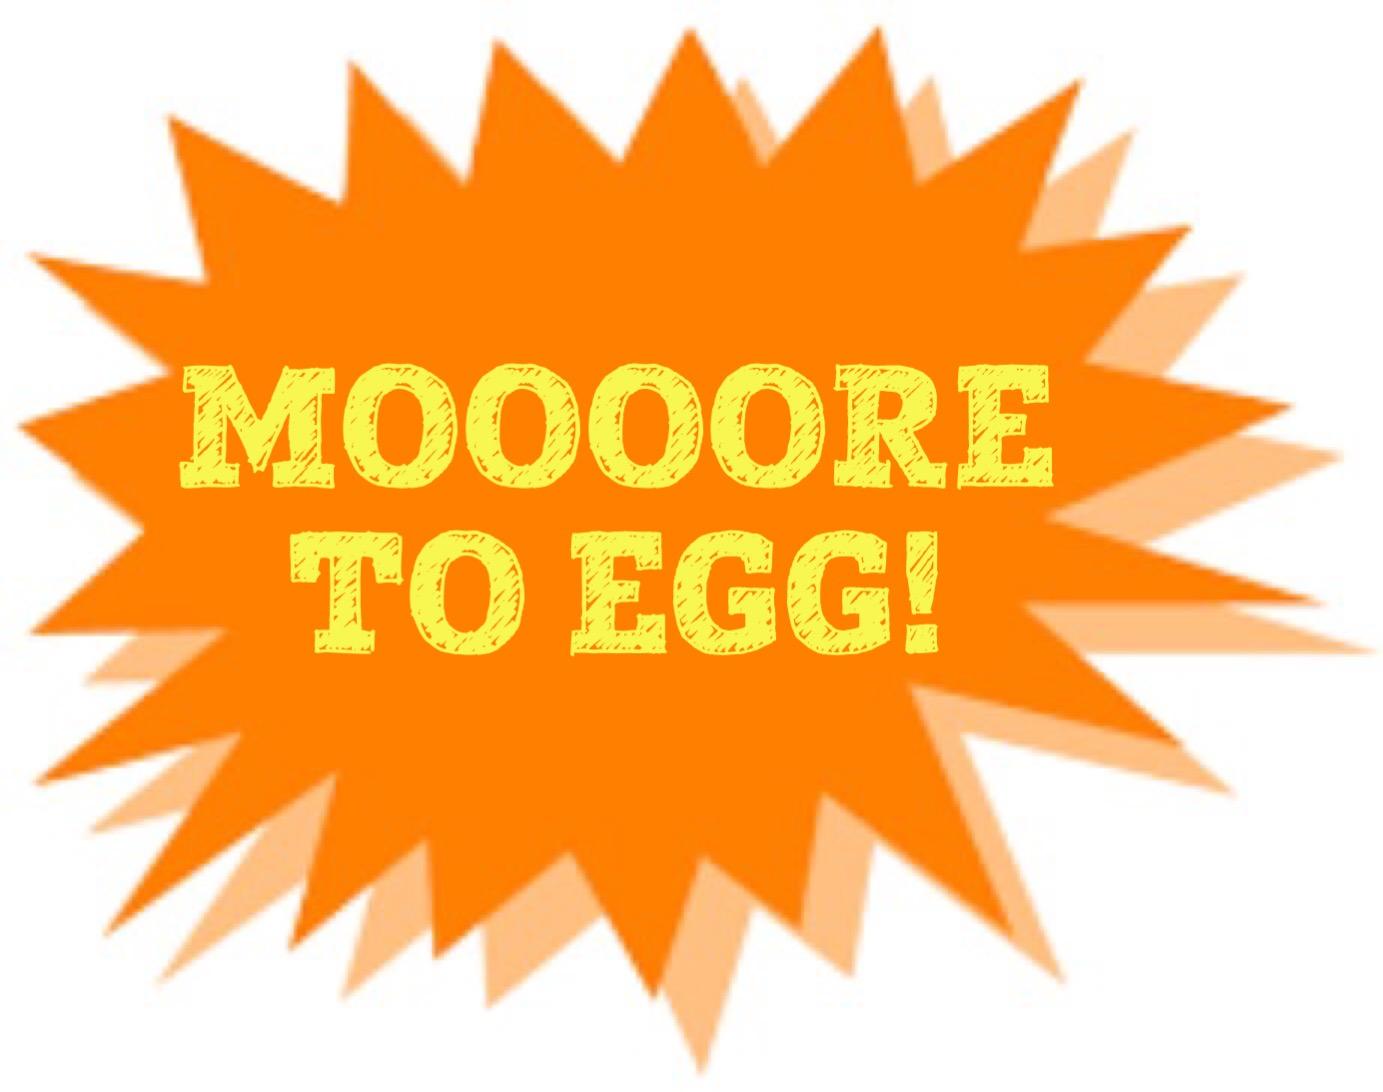 MOOOOORE TO EGG!